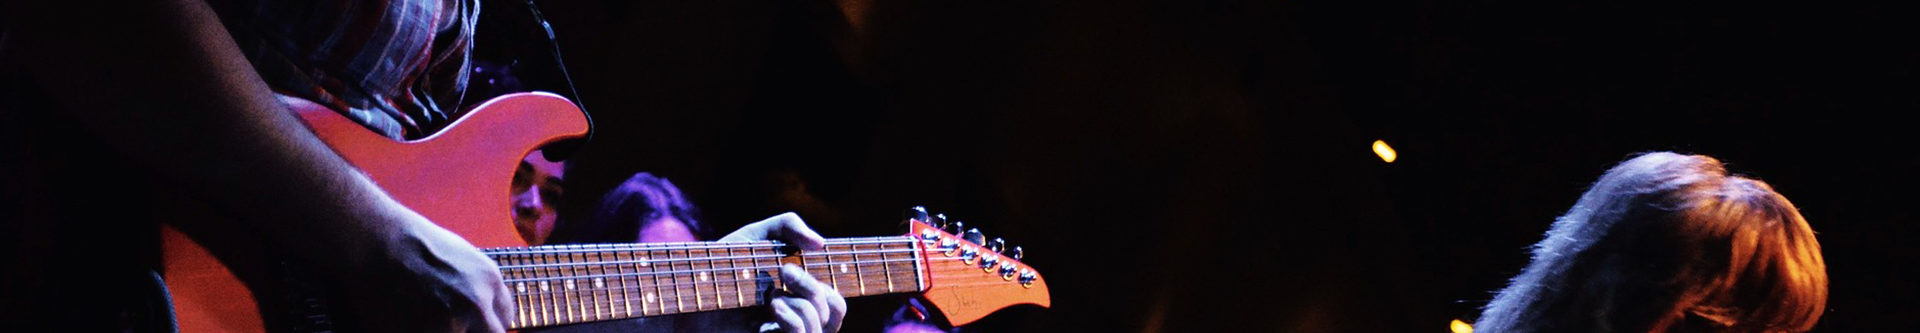 guitar soundfonts